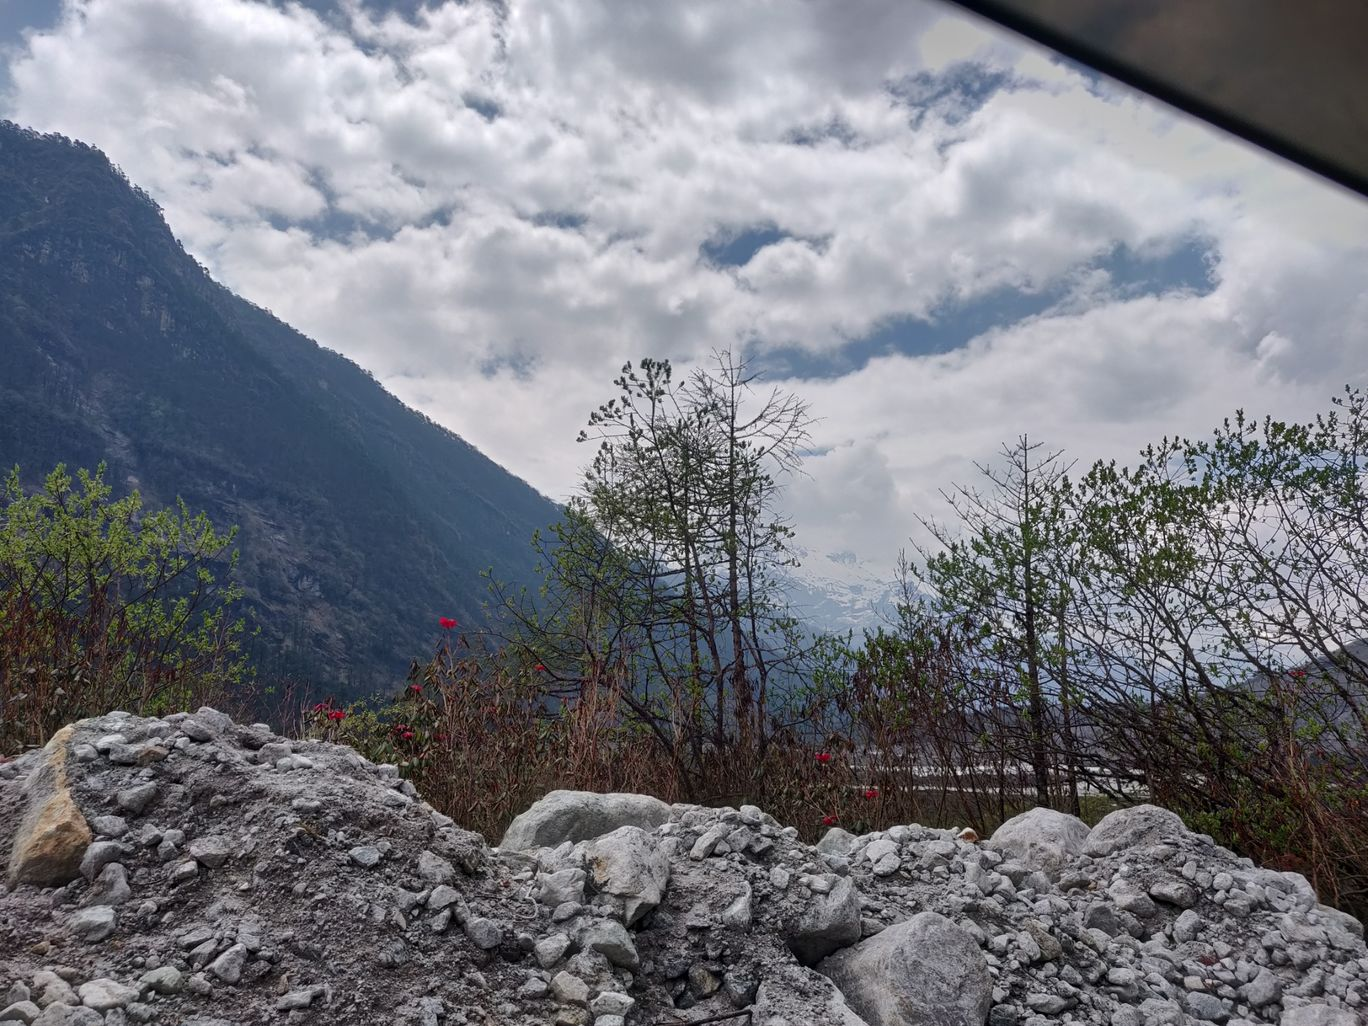 Photo of Yumthang By Anjali Jain